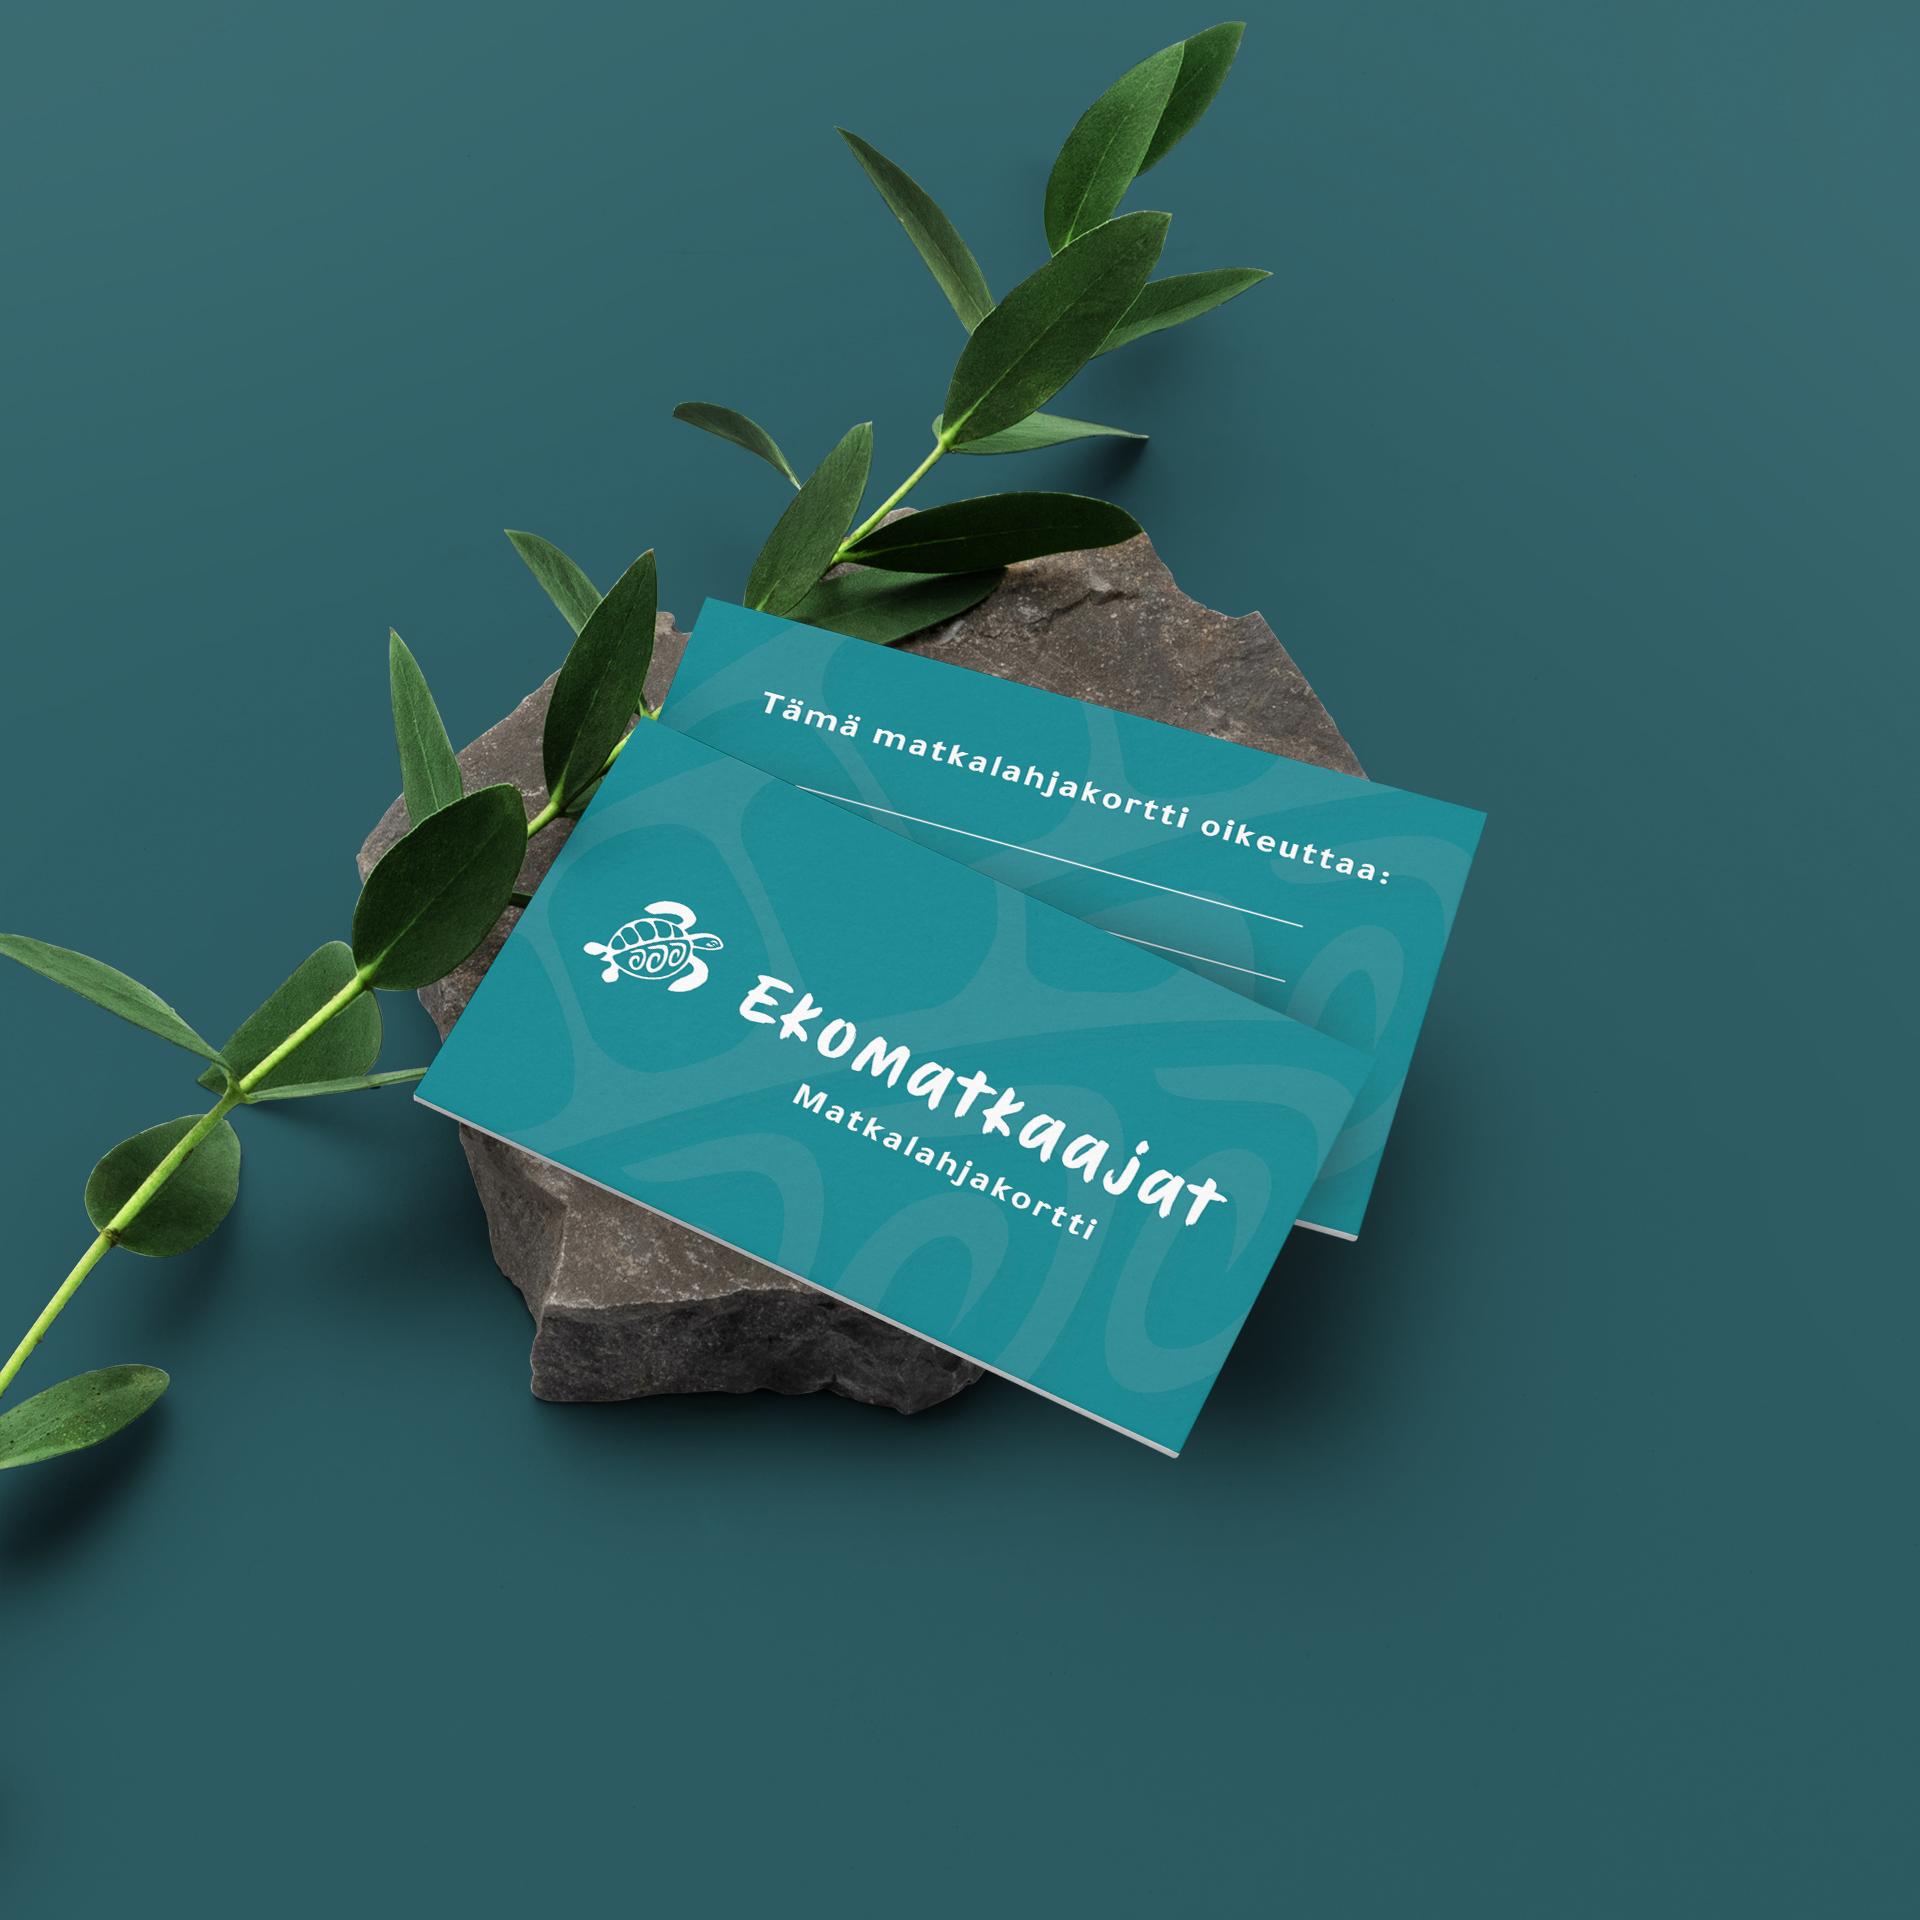 ekomatkaajat-gift-card-fb-mock-up.jpg